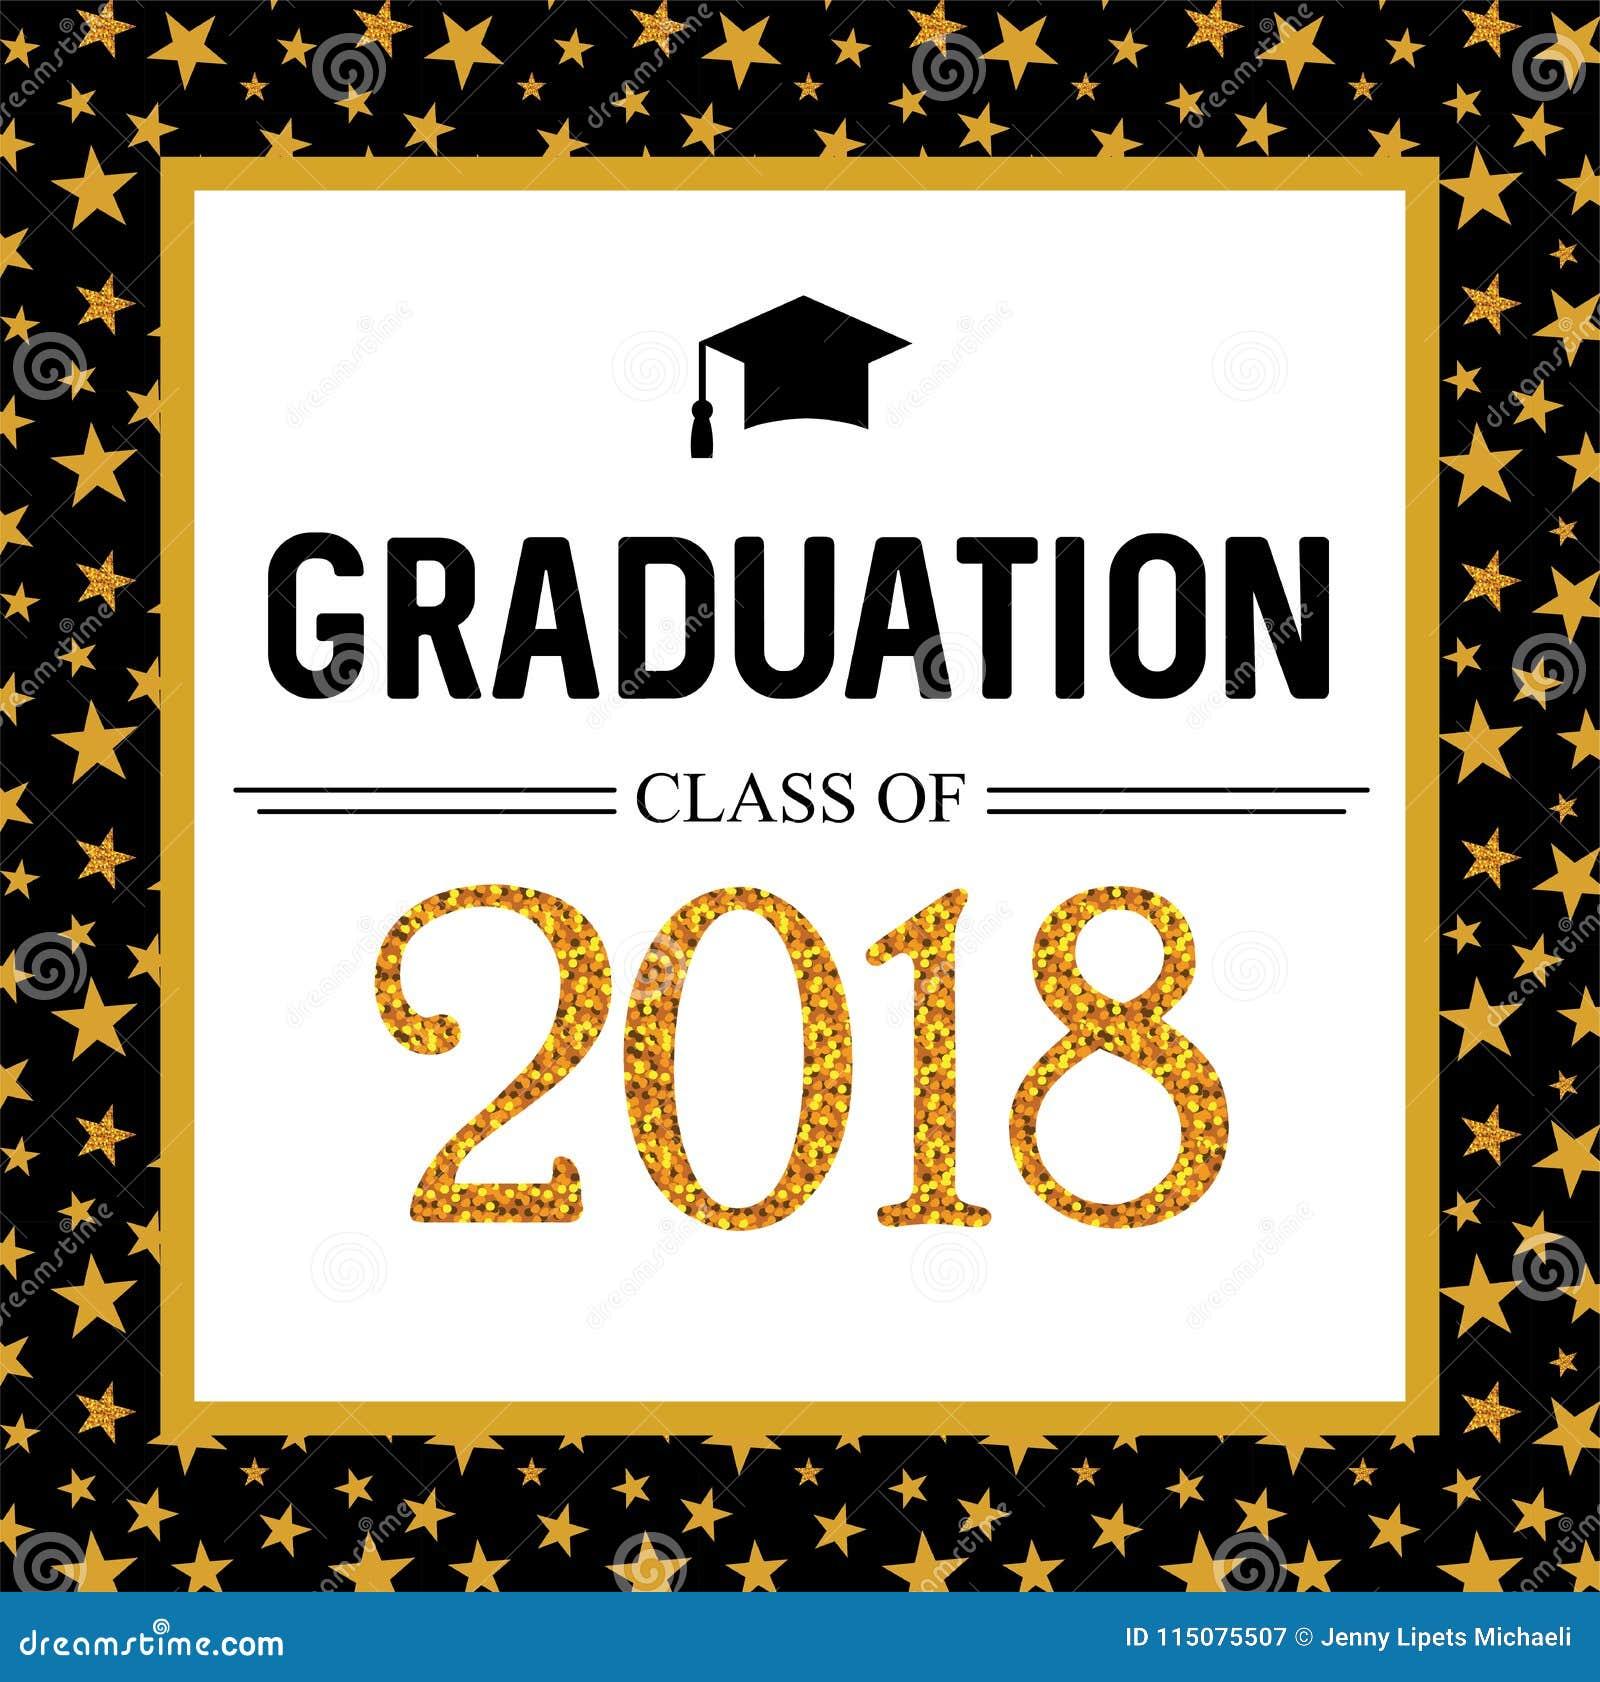 Graduation class of 2018 greeting card and invitation template download graduation class of 2018 greeting card and invitation template vector party invitation grad stopboris Choice Image